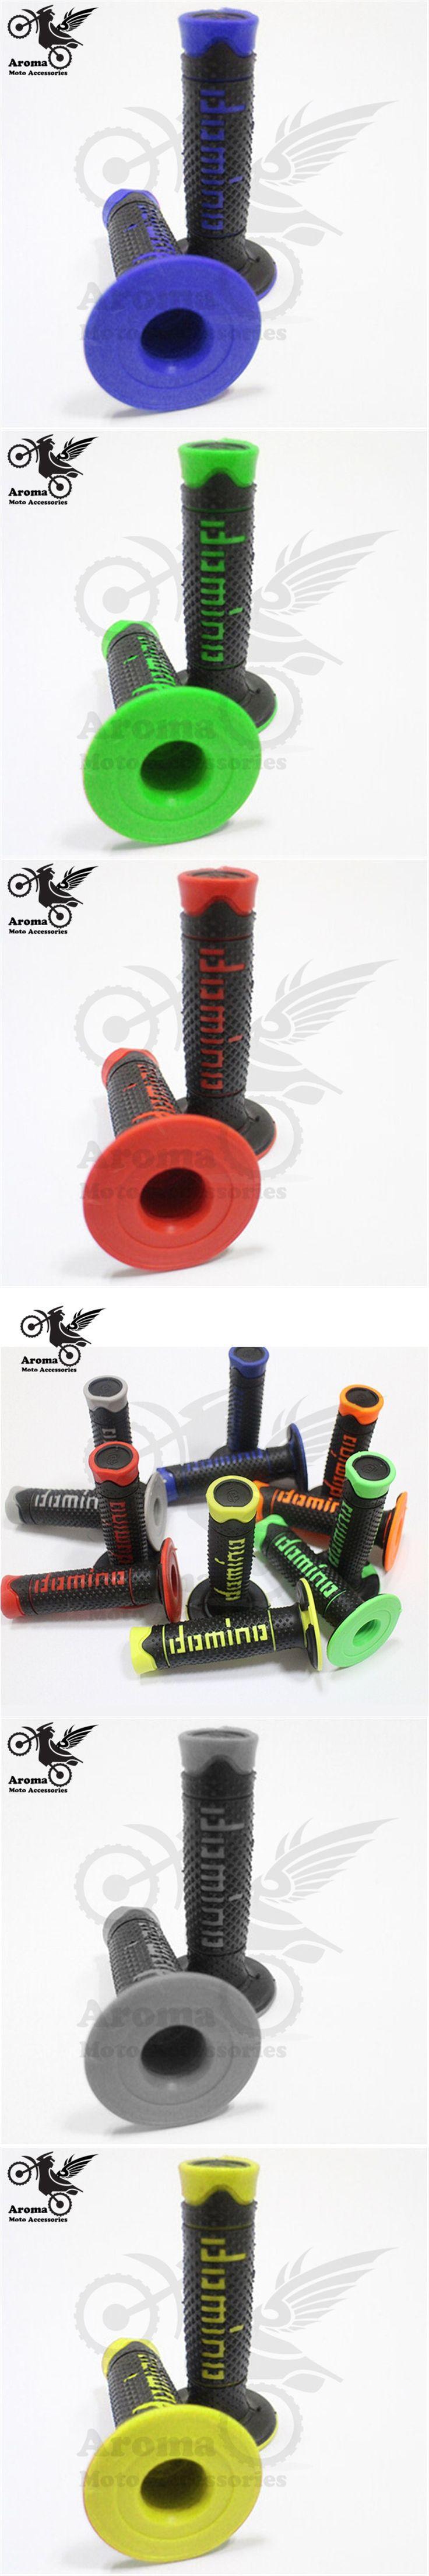 universal dirt pit bike handle bar handle Grips ATV parts moto handle grips for KTM motocross grip rubber motorcycle handlebar